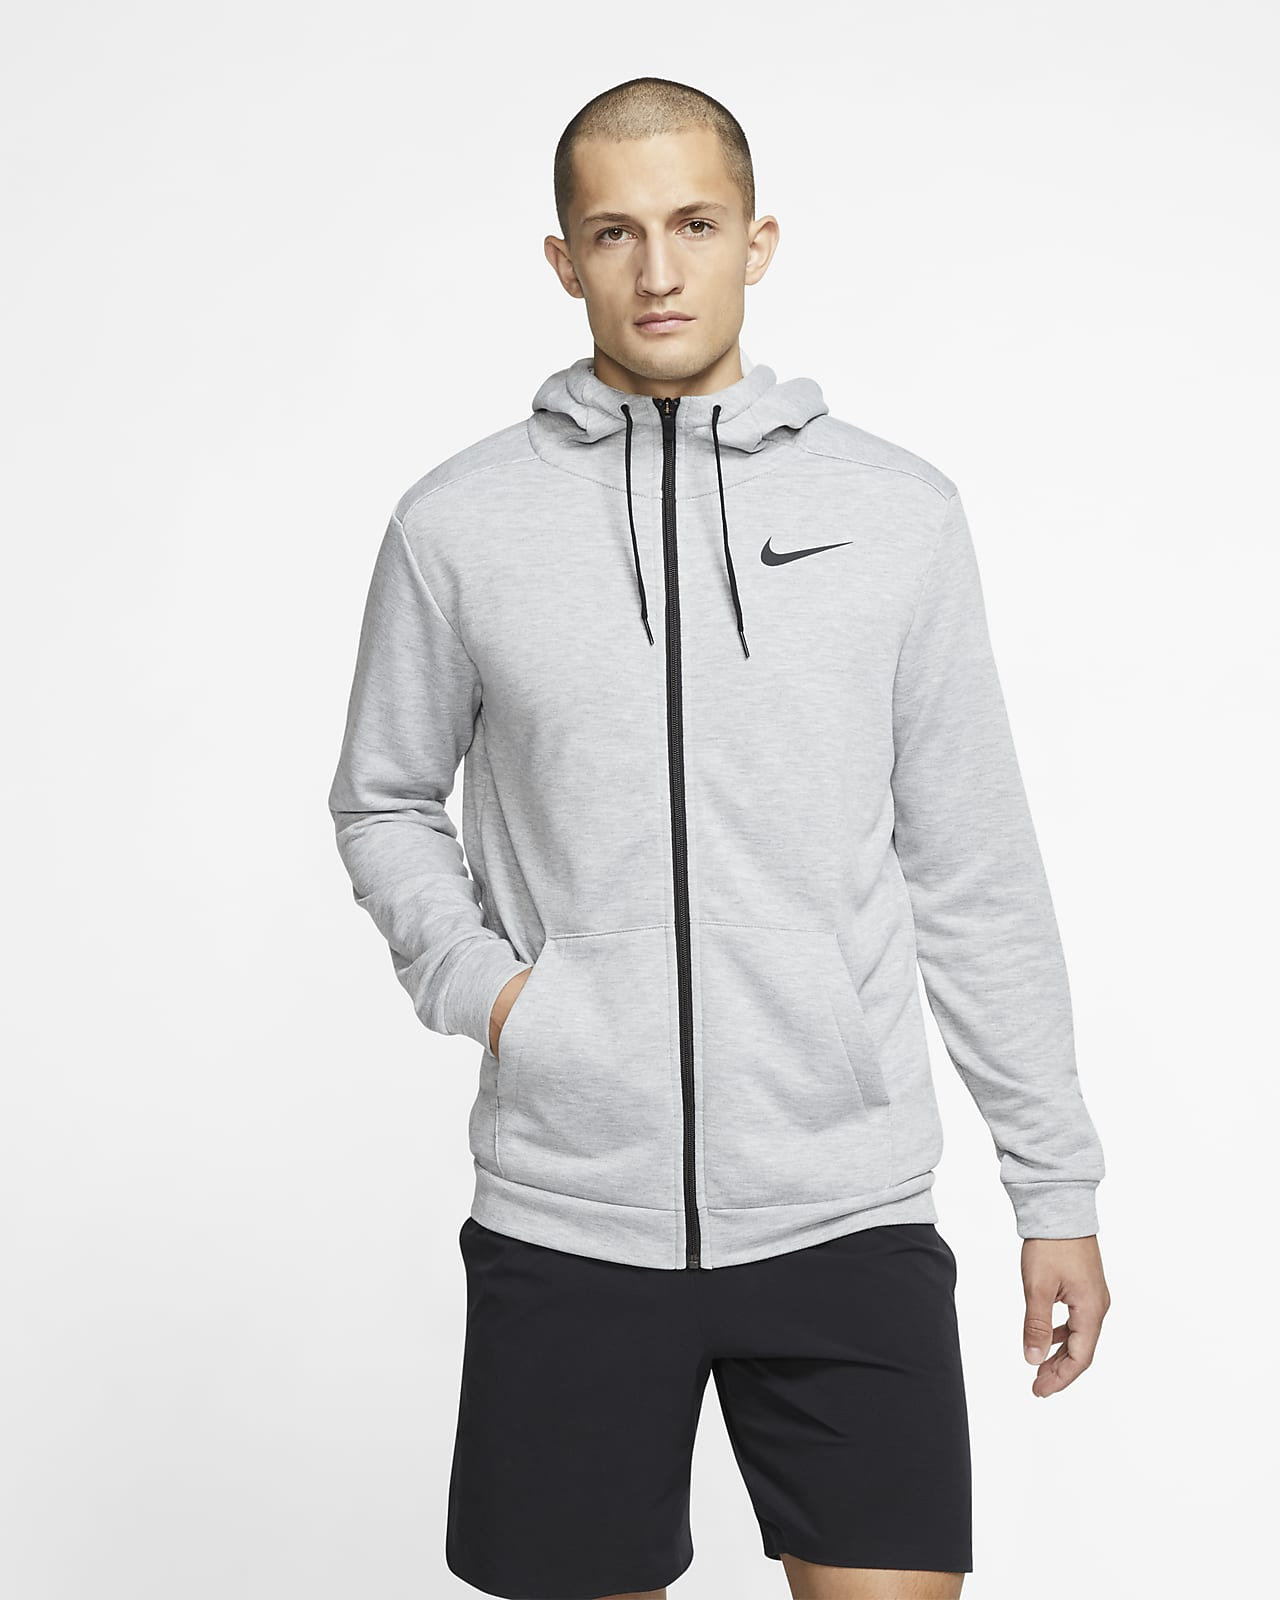 Hombre NIKE Sportswear Optic Hoodie FZ Sudadera